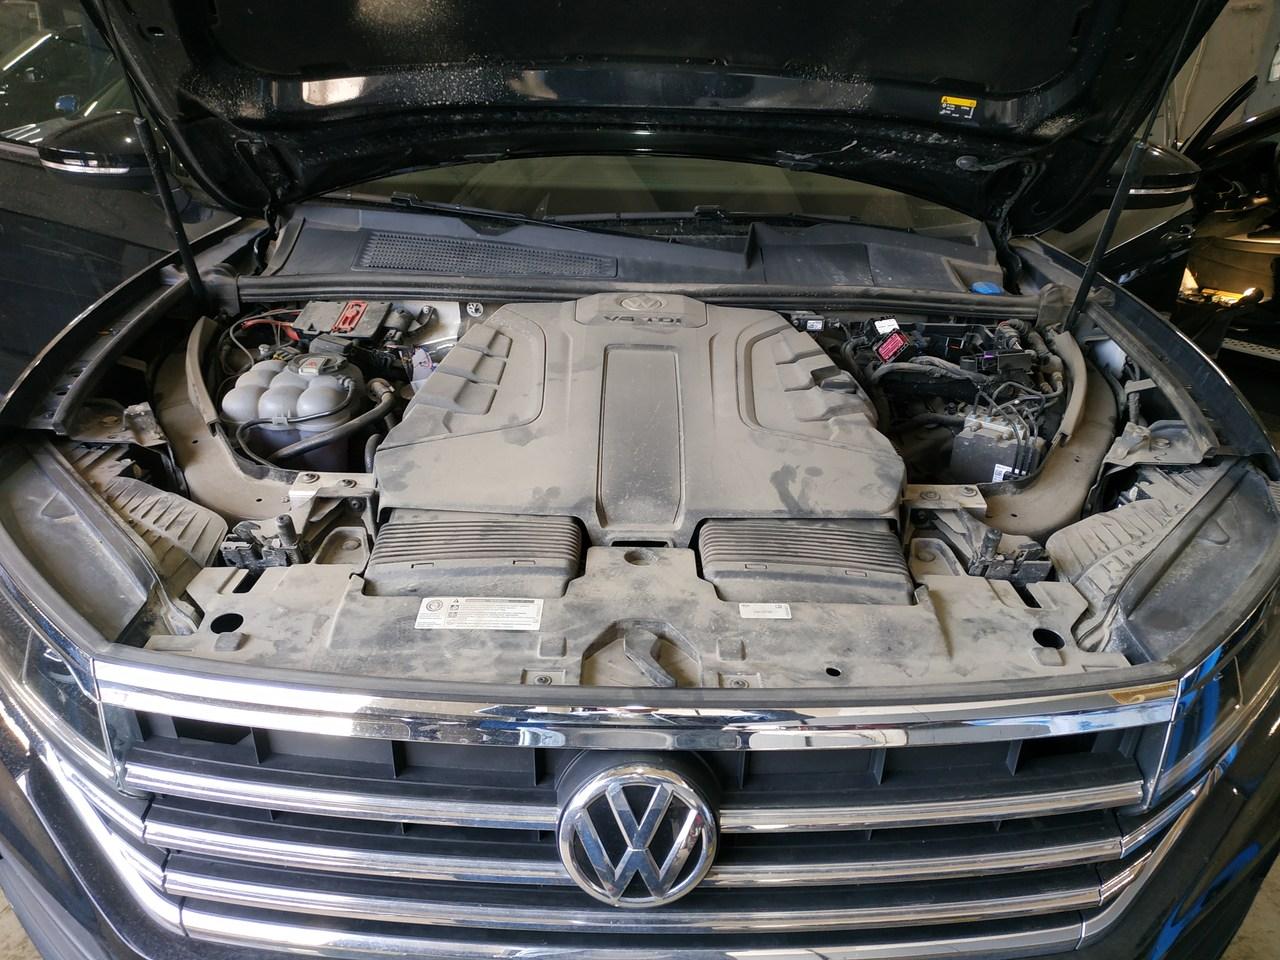 V6 TDI 3.0d, Volkswagen Touareg II